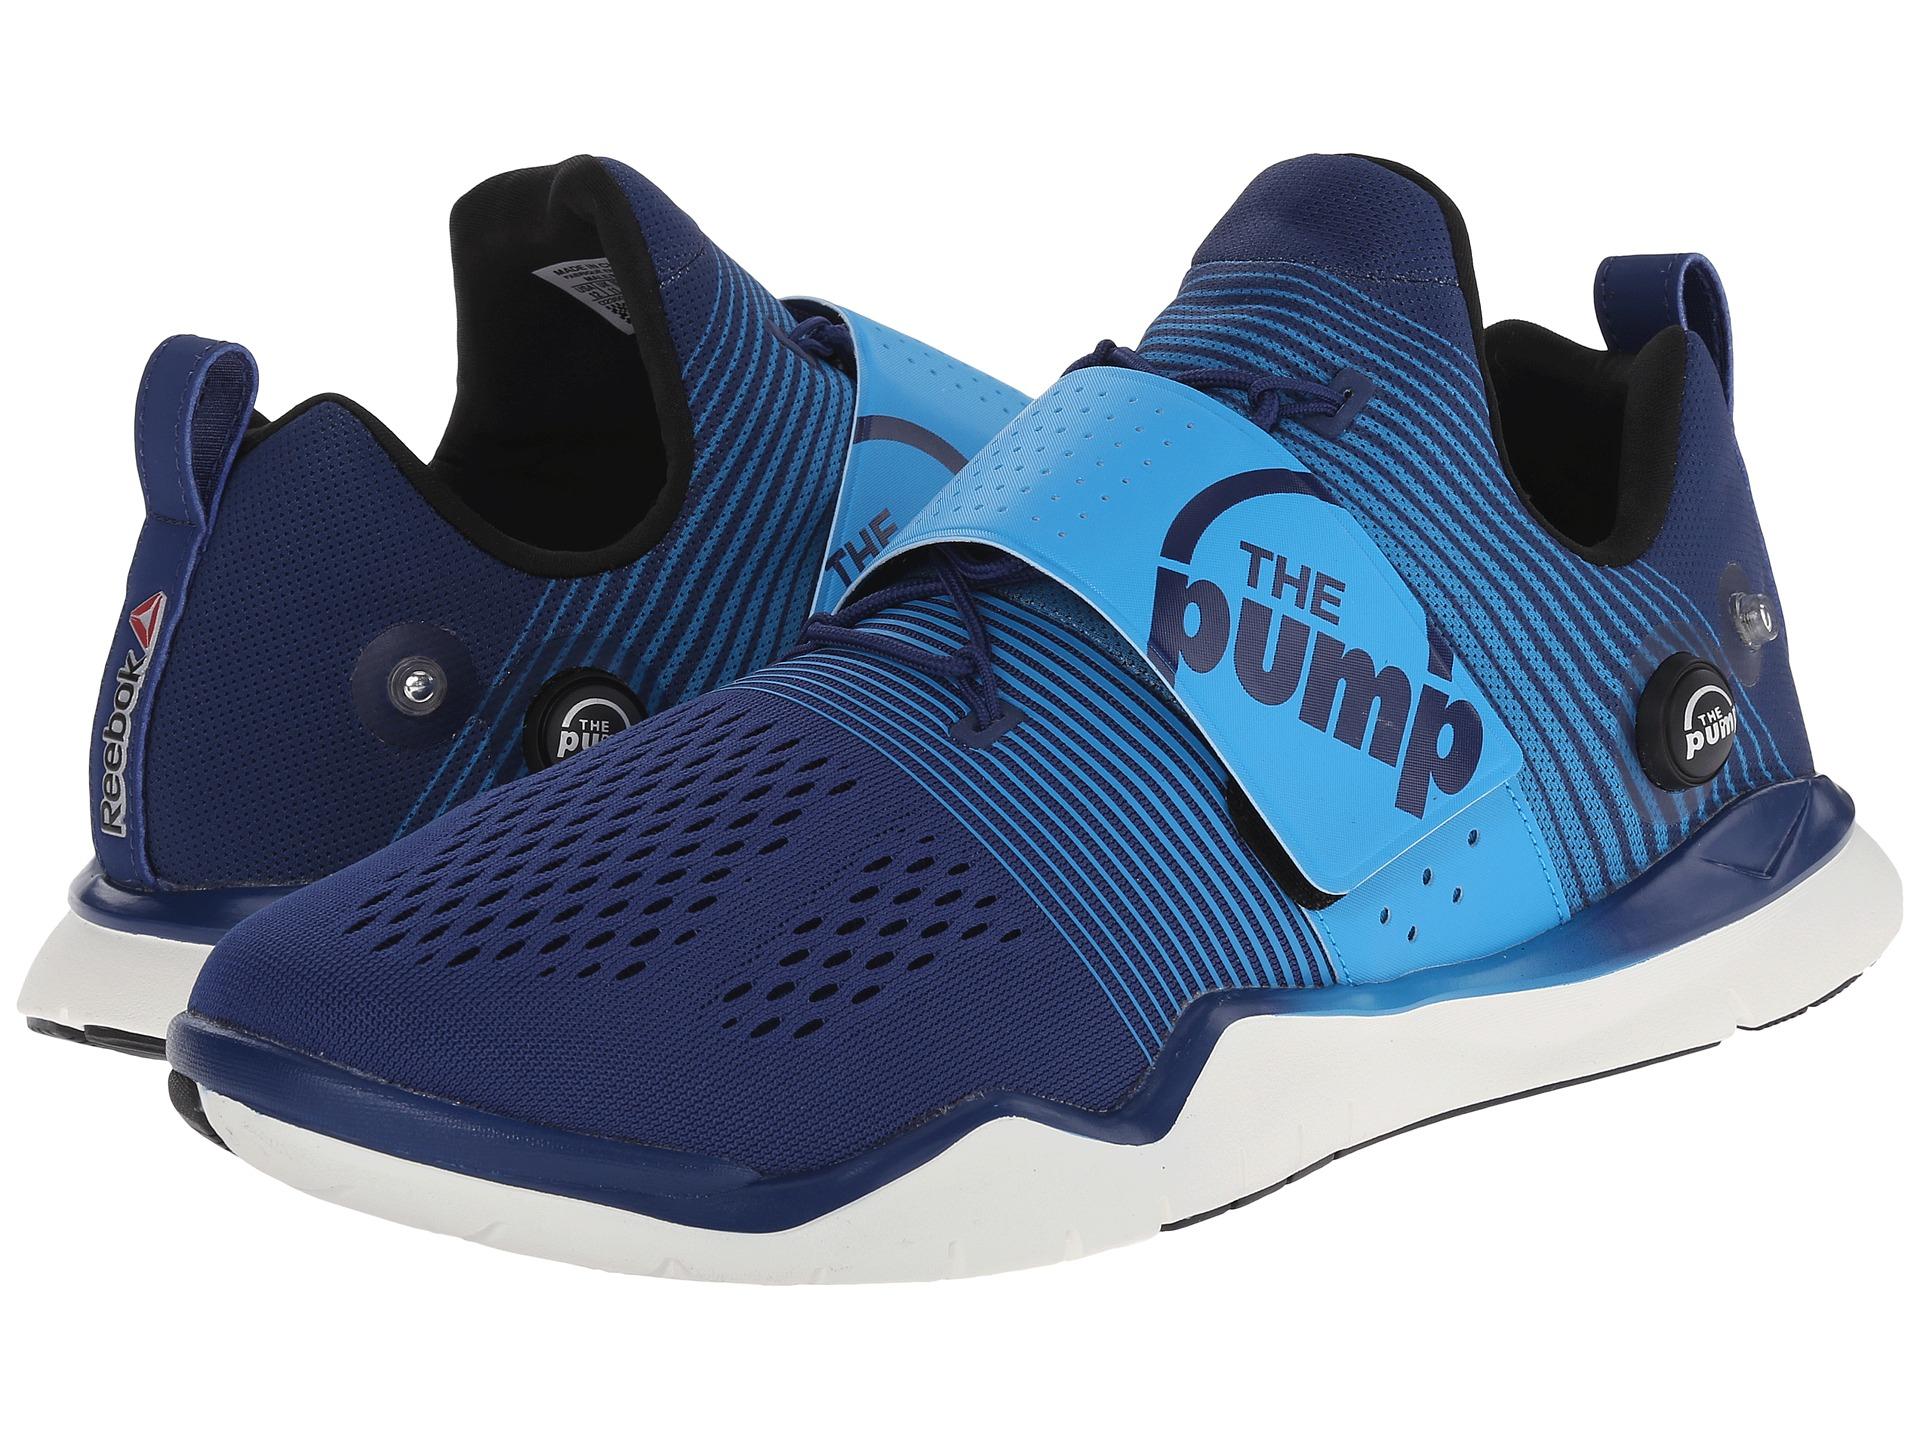 Lyst - Reebok Zpump Fusion Tr in Blue for Men 56f75e986